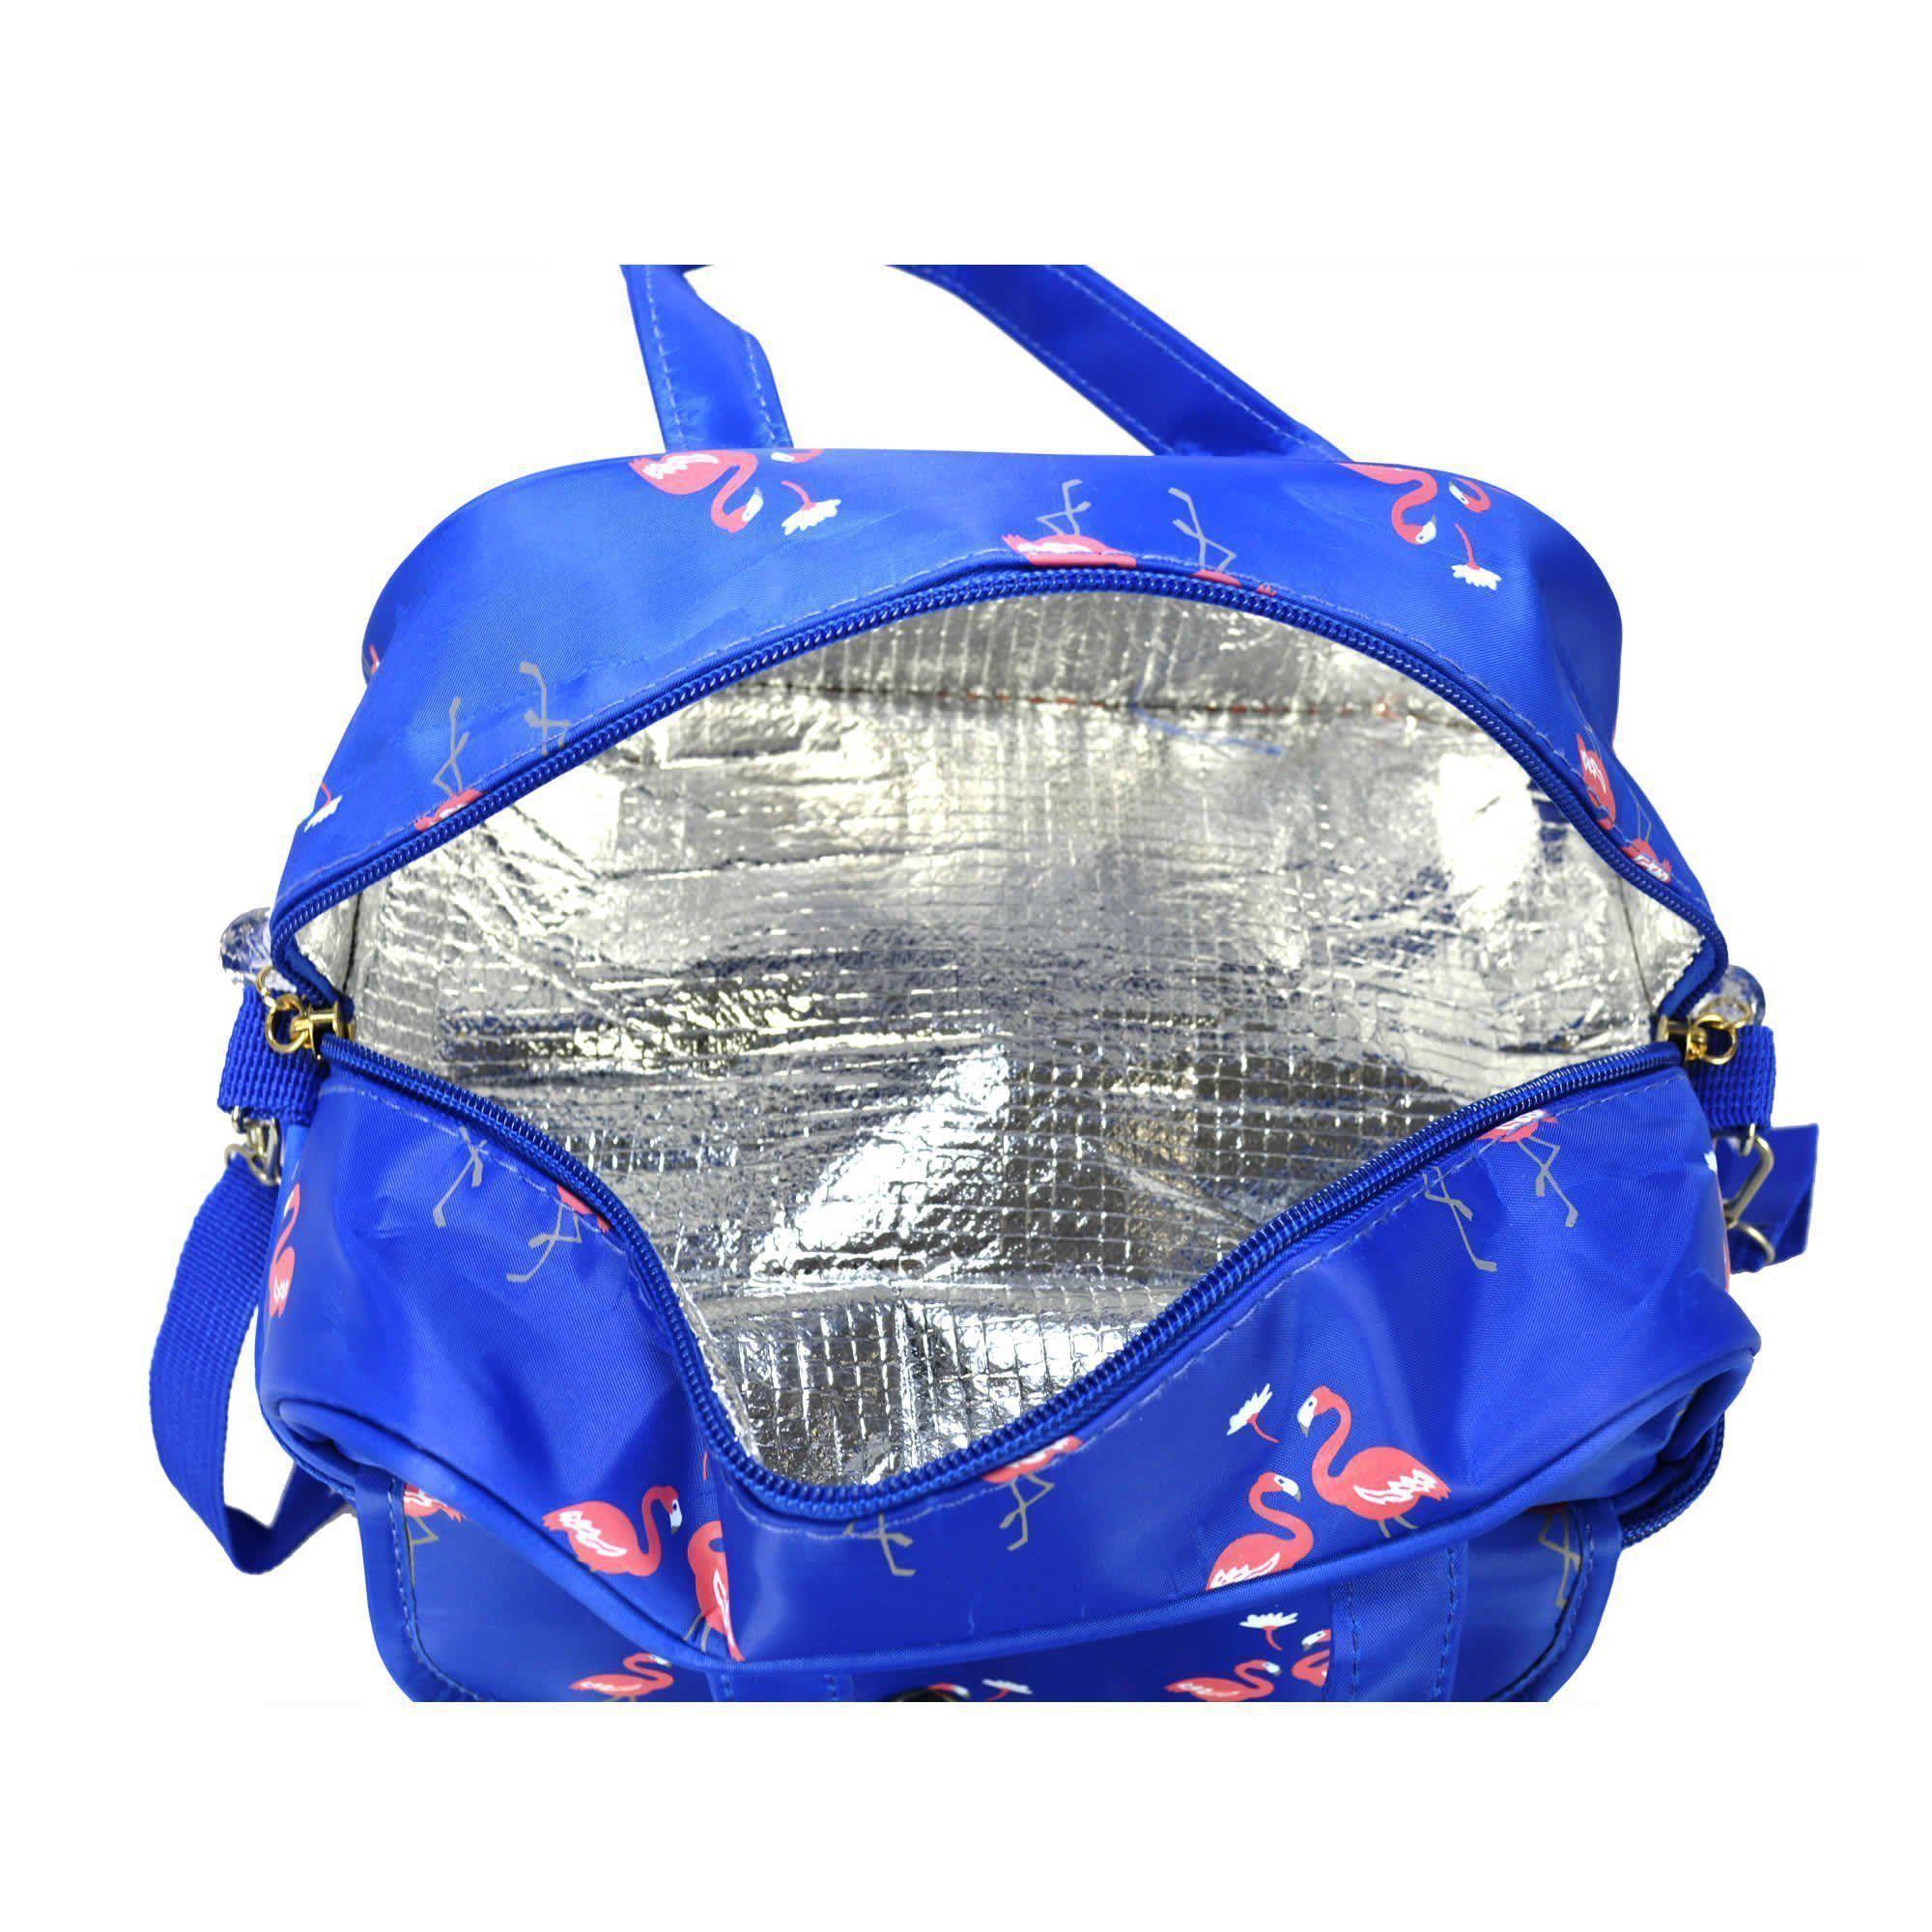 Necessaire Feminina Bolsa Térmica Azul CBRN05833